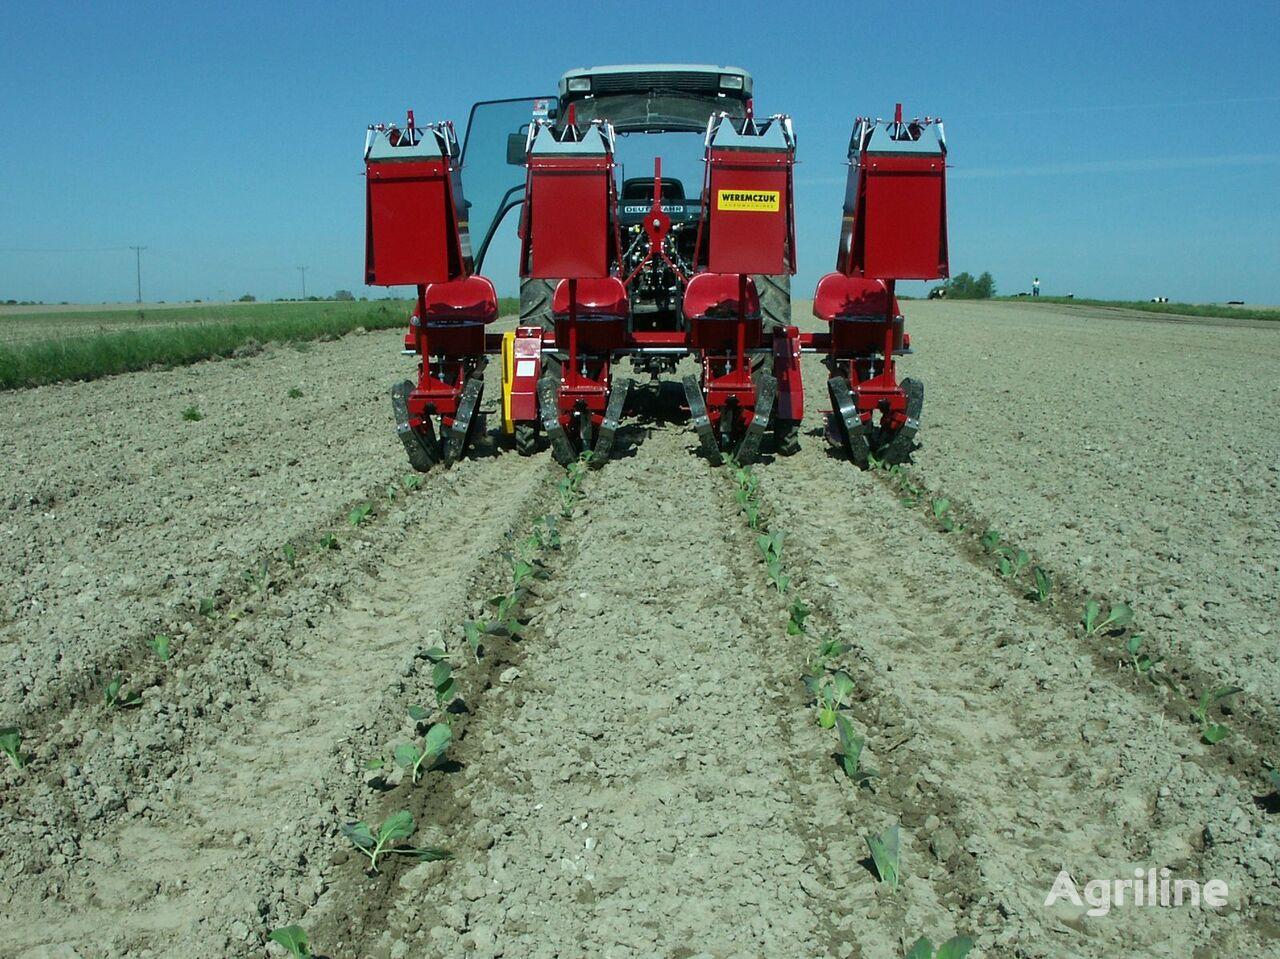 Weremczuk Patryk 2 Transplanters For Sale Seedling Planter From